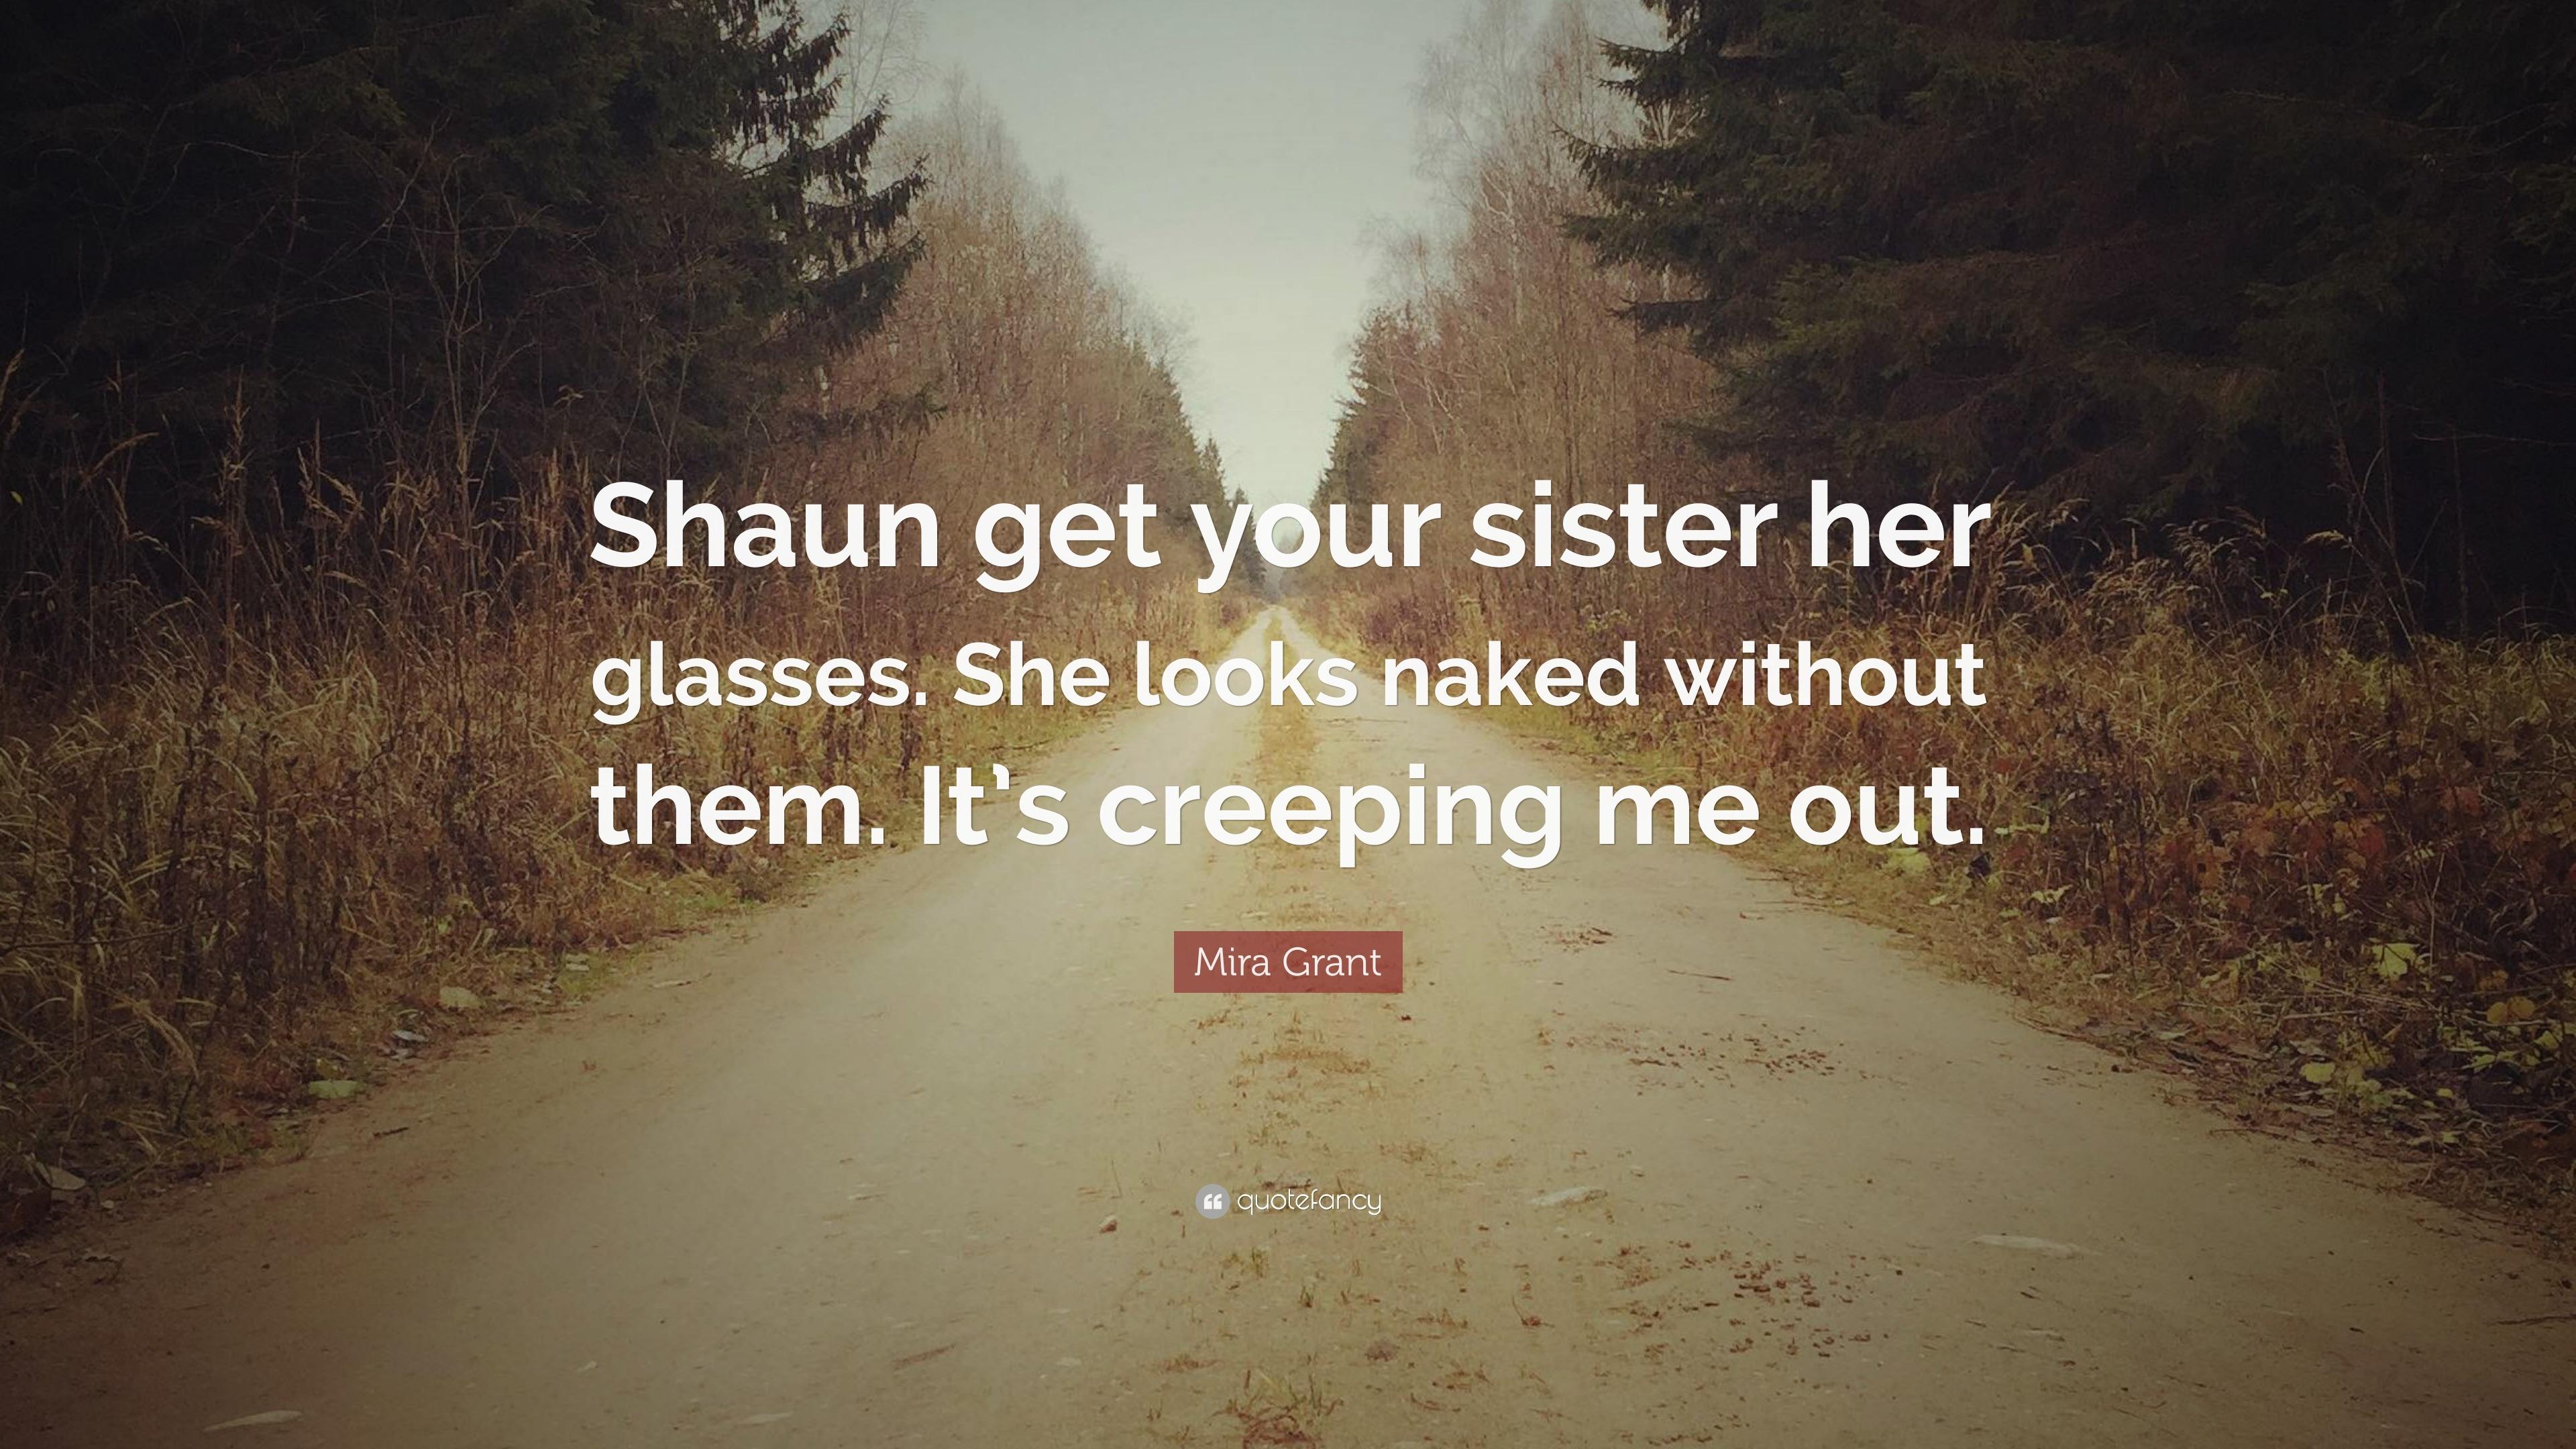 On his sister Creeping